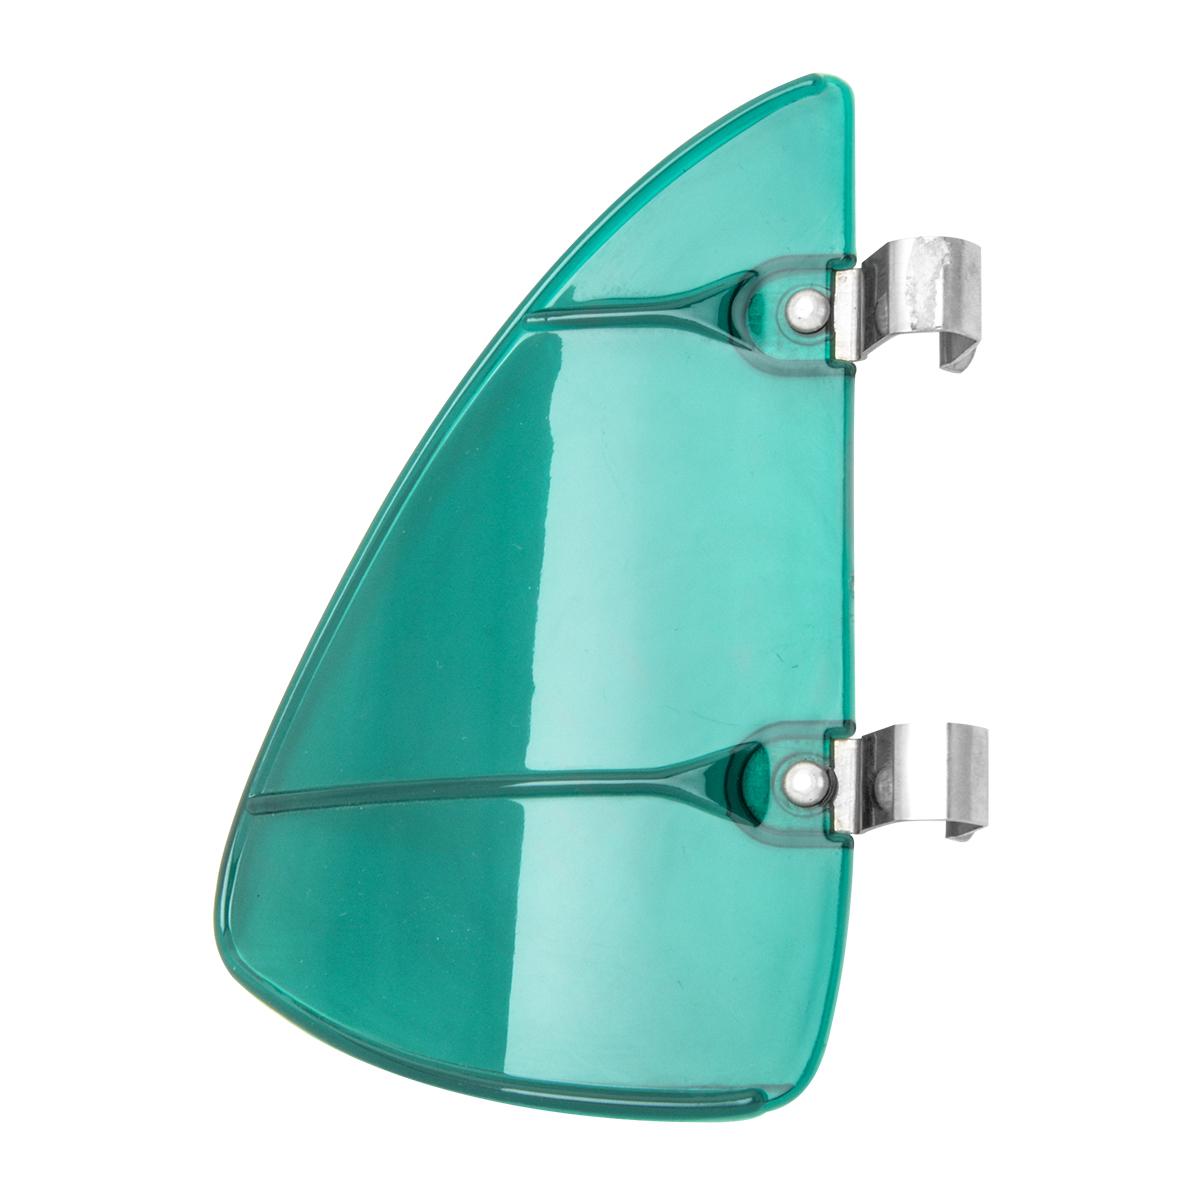 #50153 Acrylic Vent Wind Window Breeze w/ Stainless Steel Clips - Green